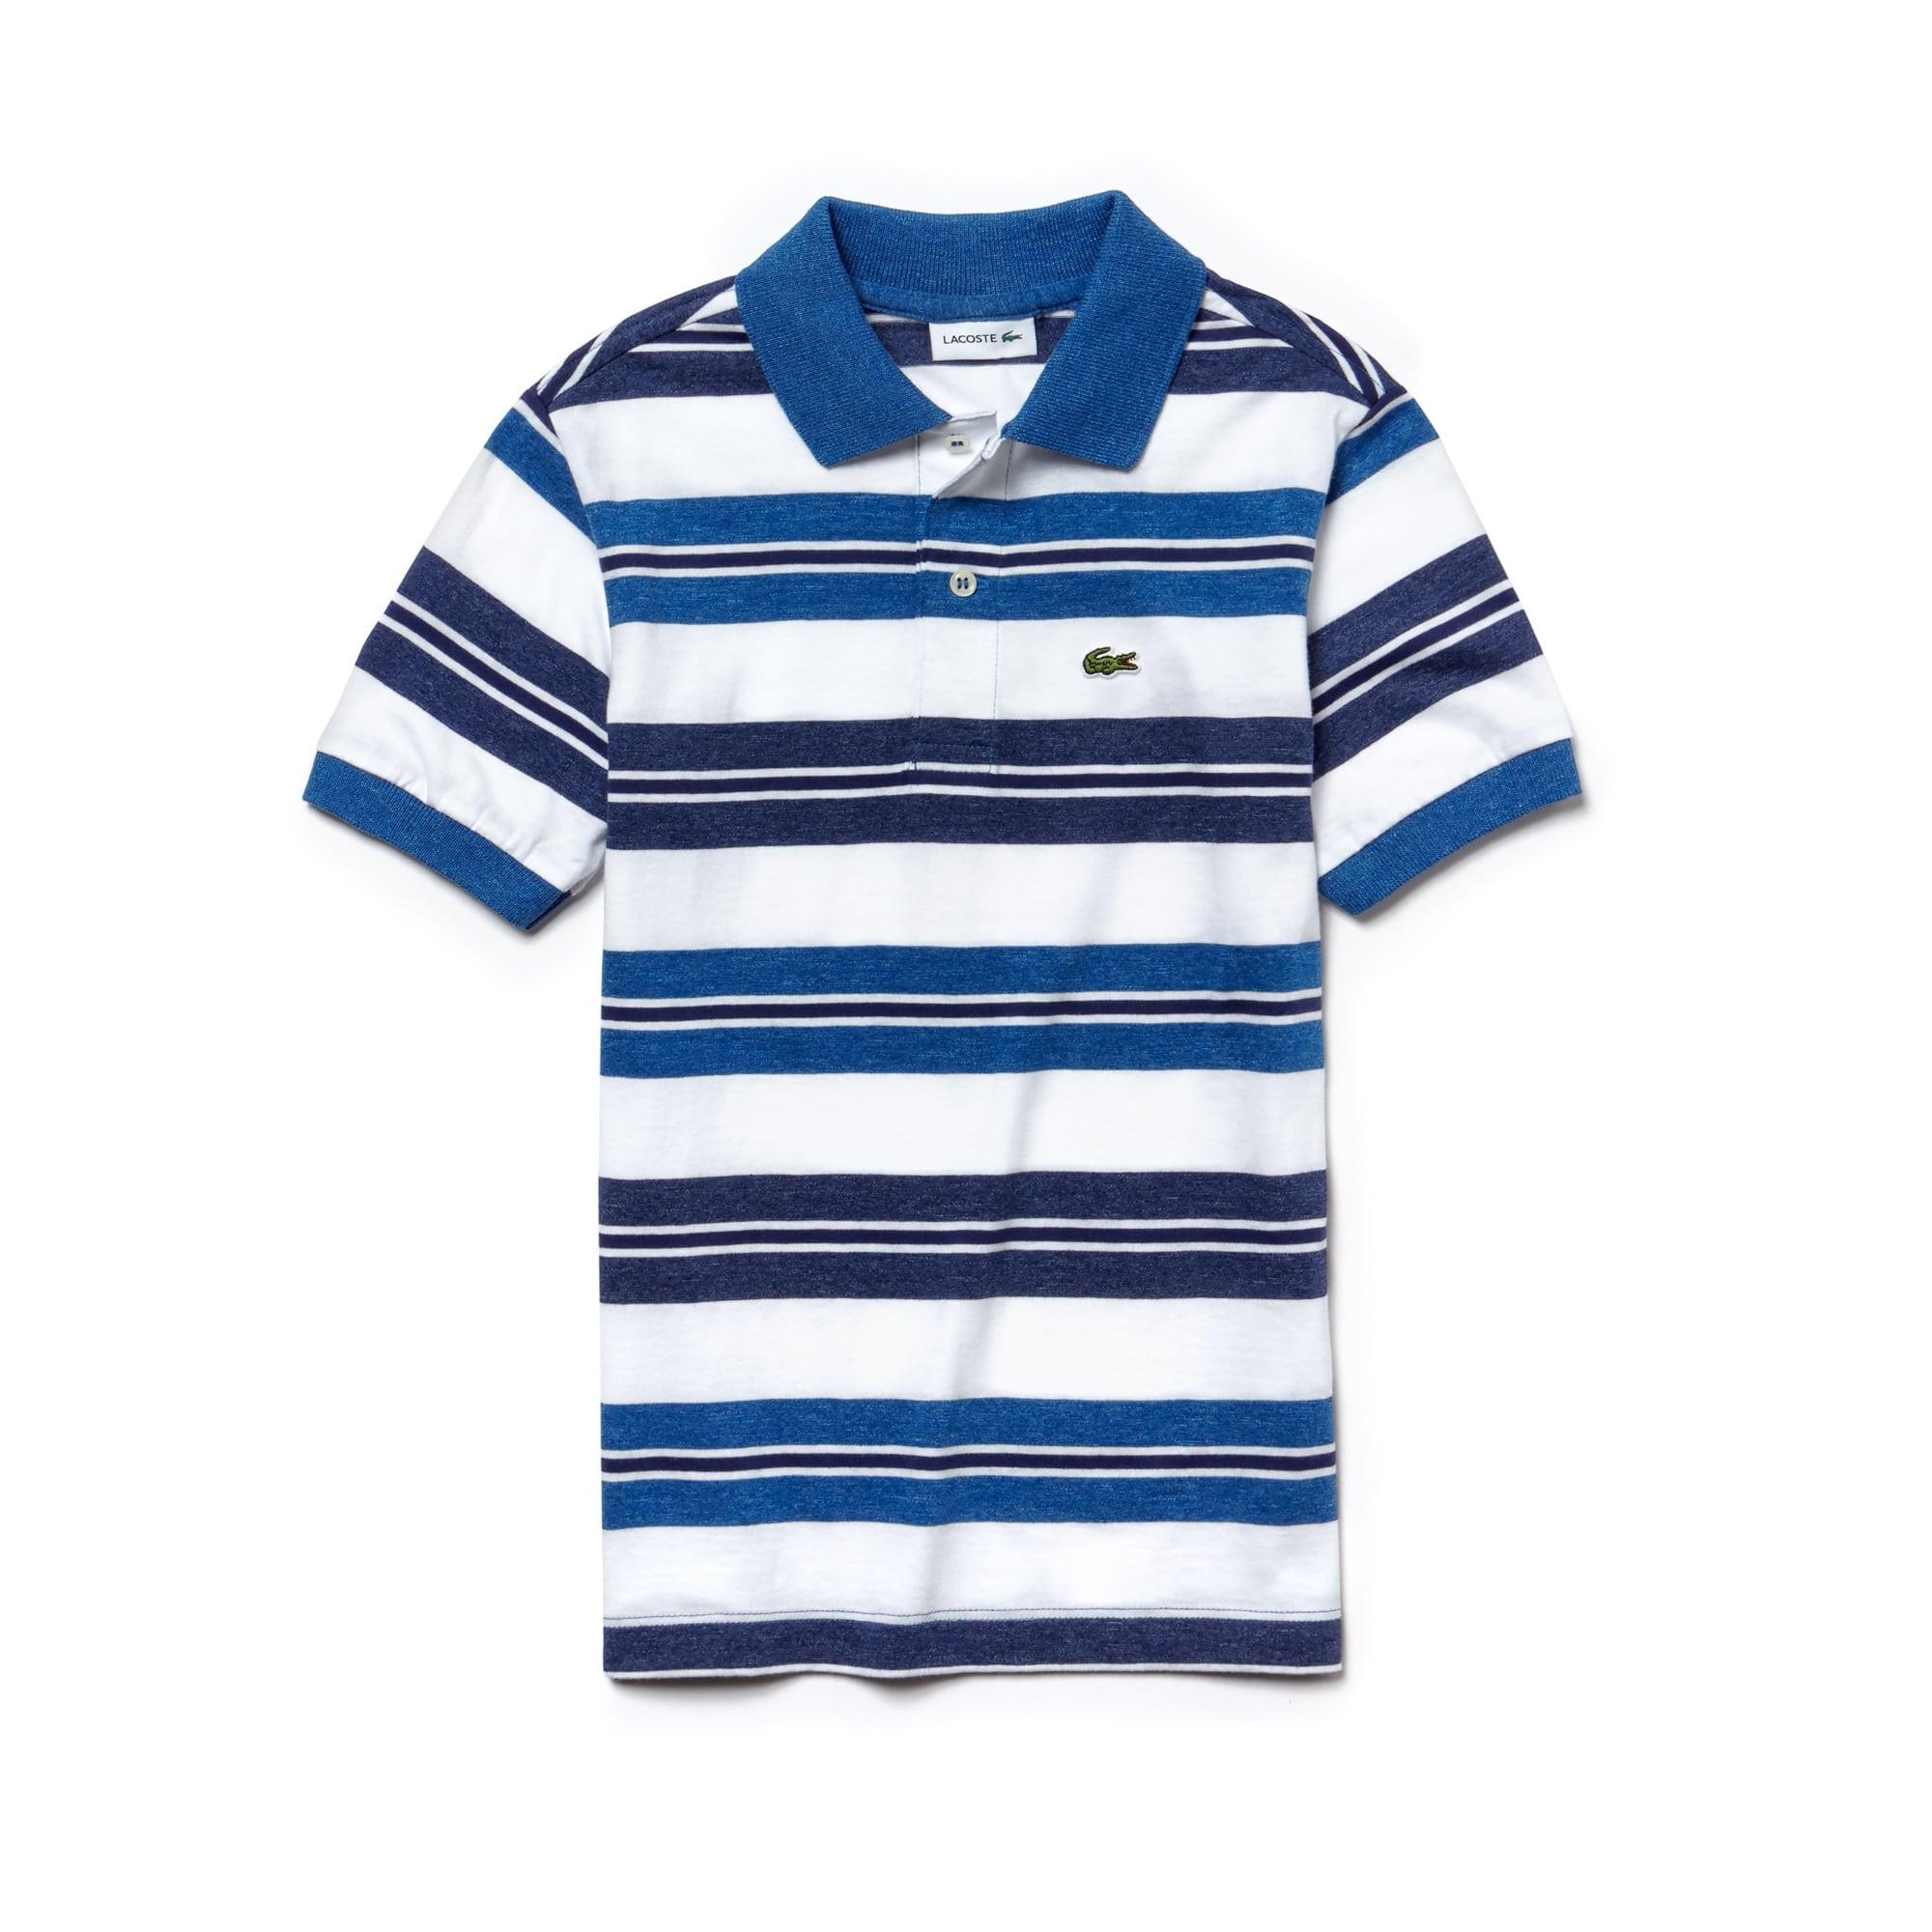 Boys' Lacoste Striped Cotton Jersey Polo Shirt